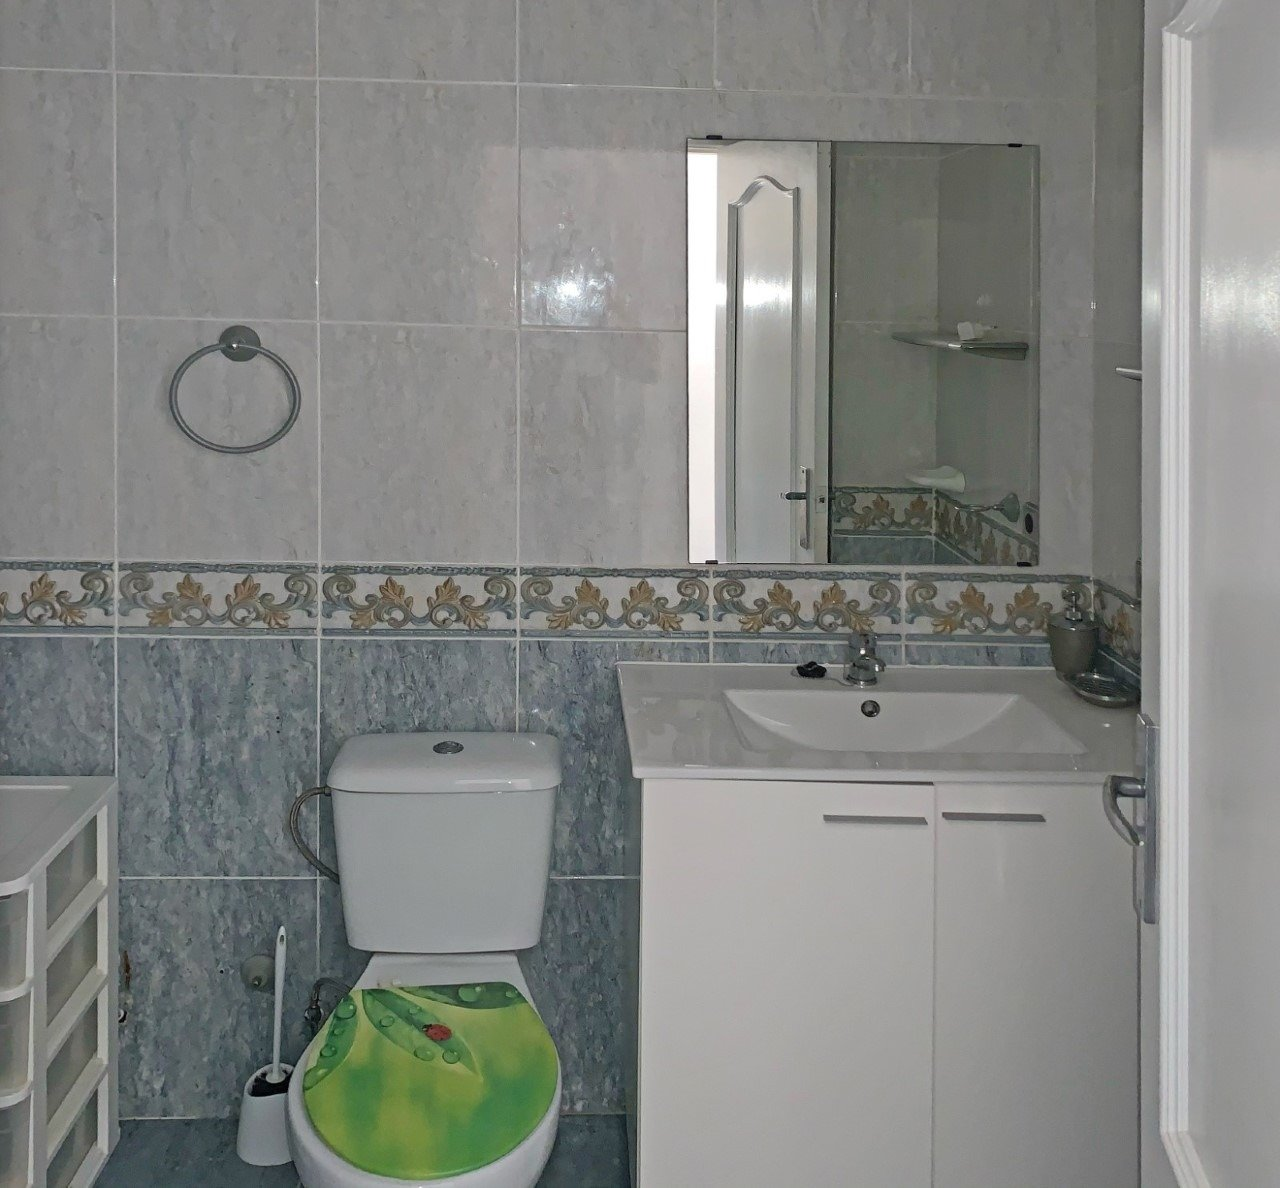 Precioso piso en palma de mallorca en zona foners - imagenInmueble28